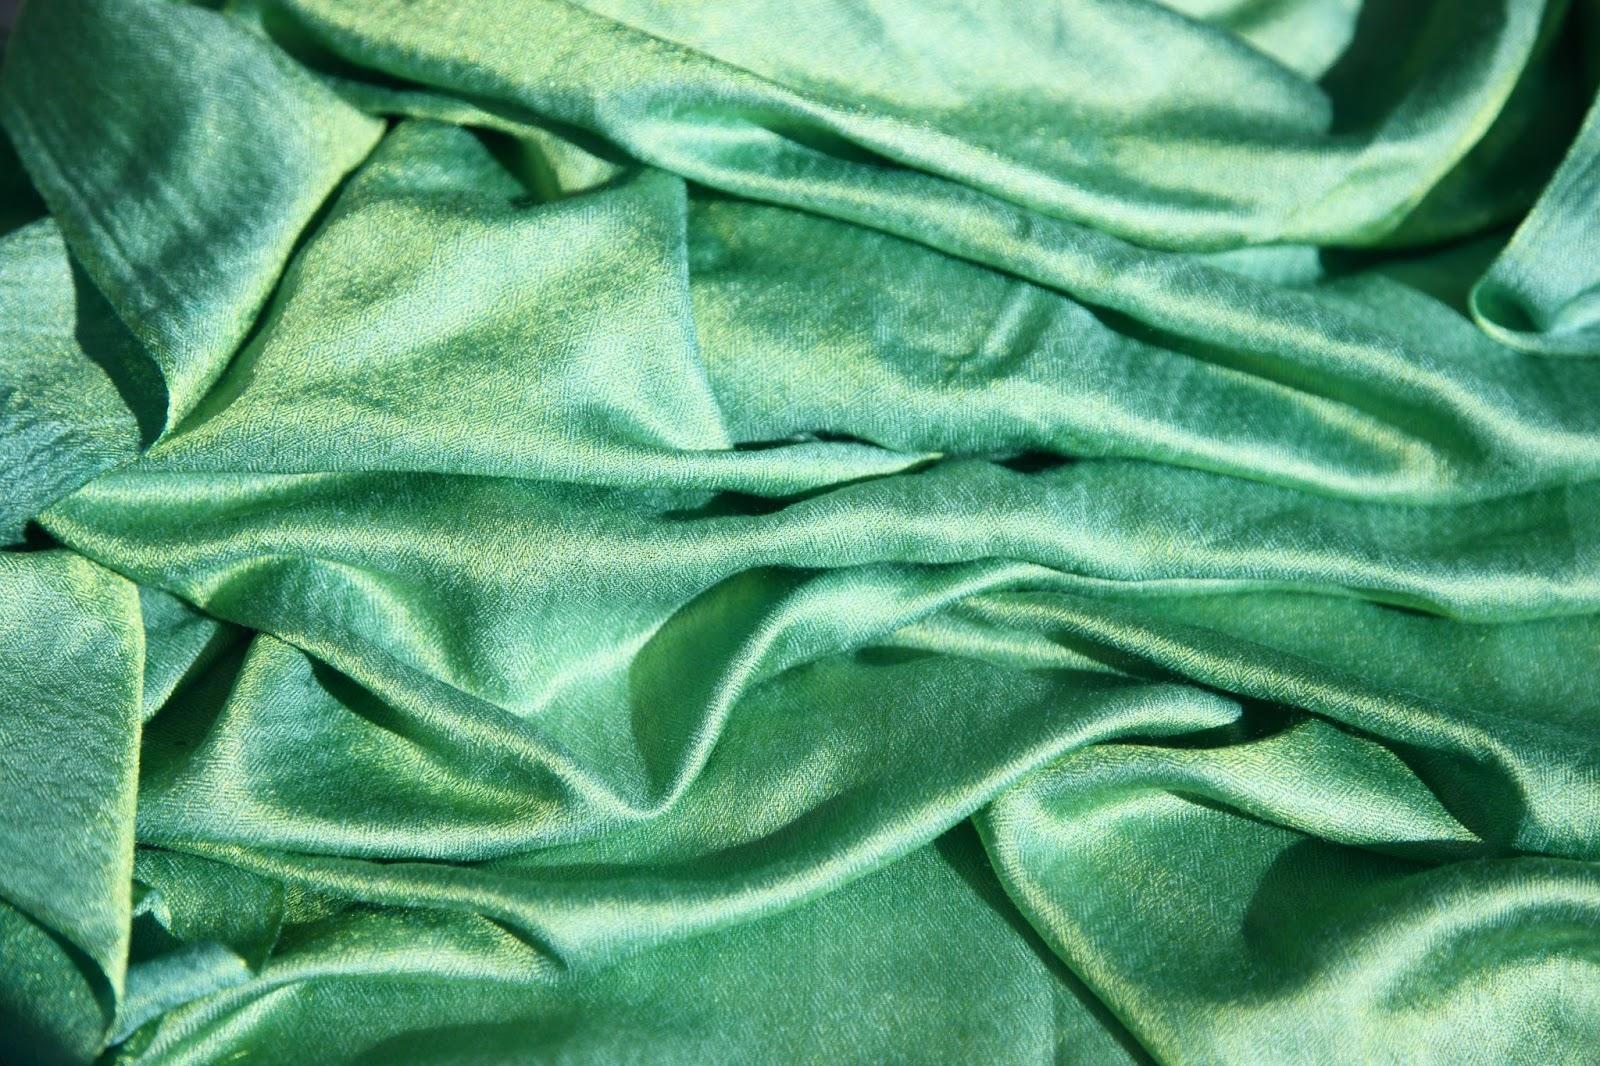 green viscose fabric